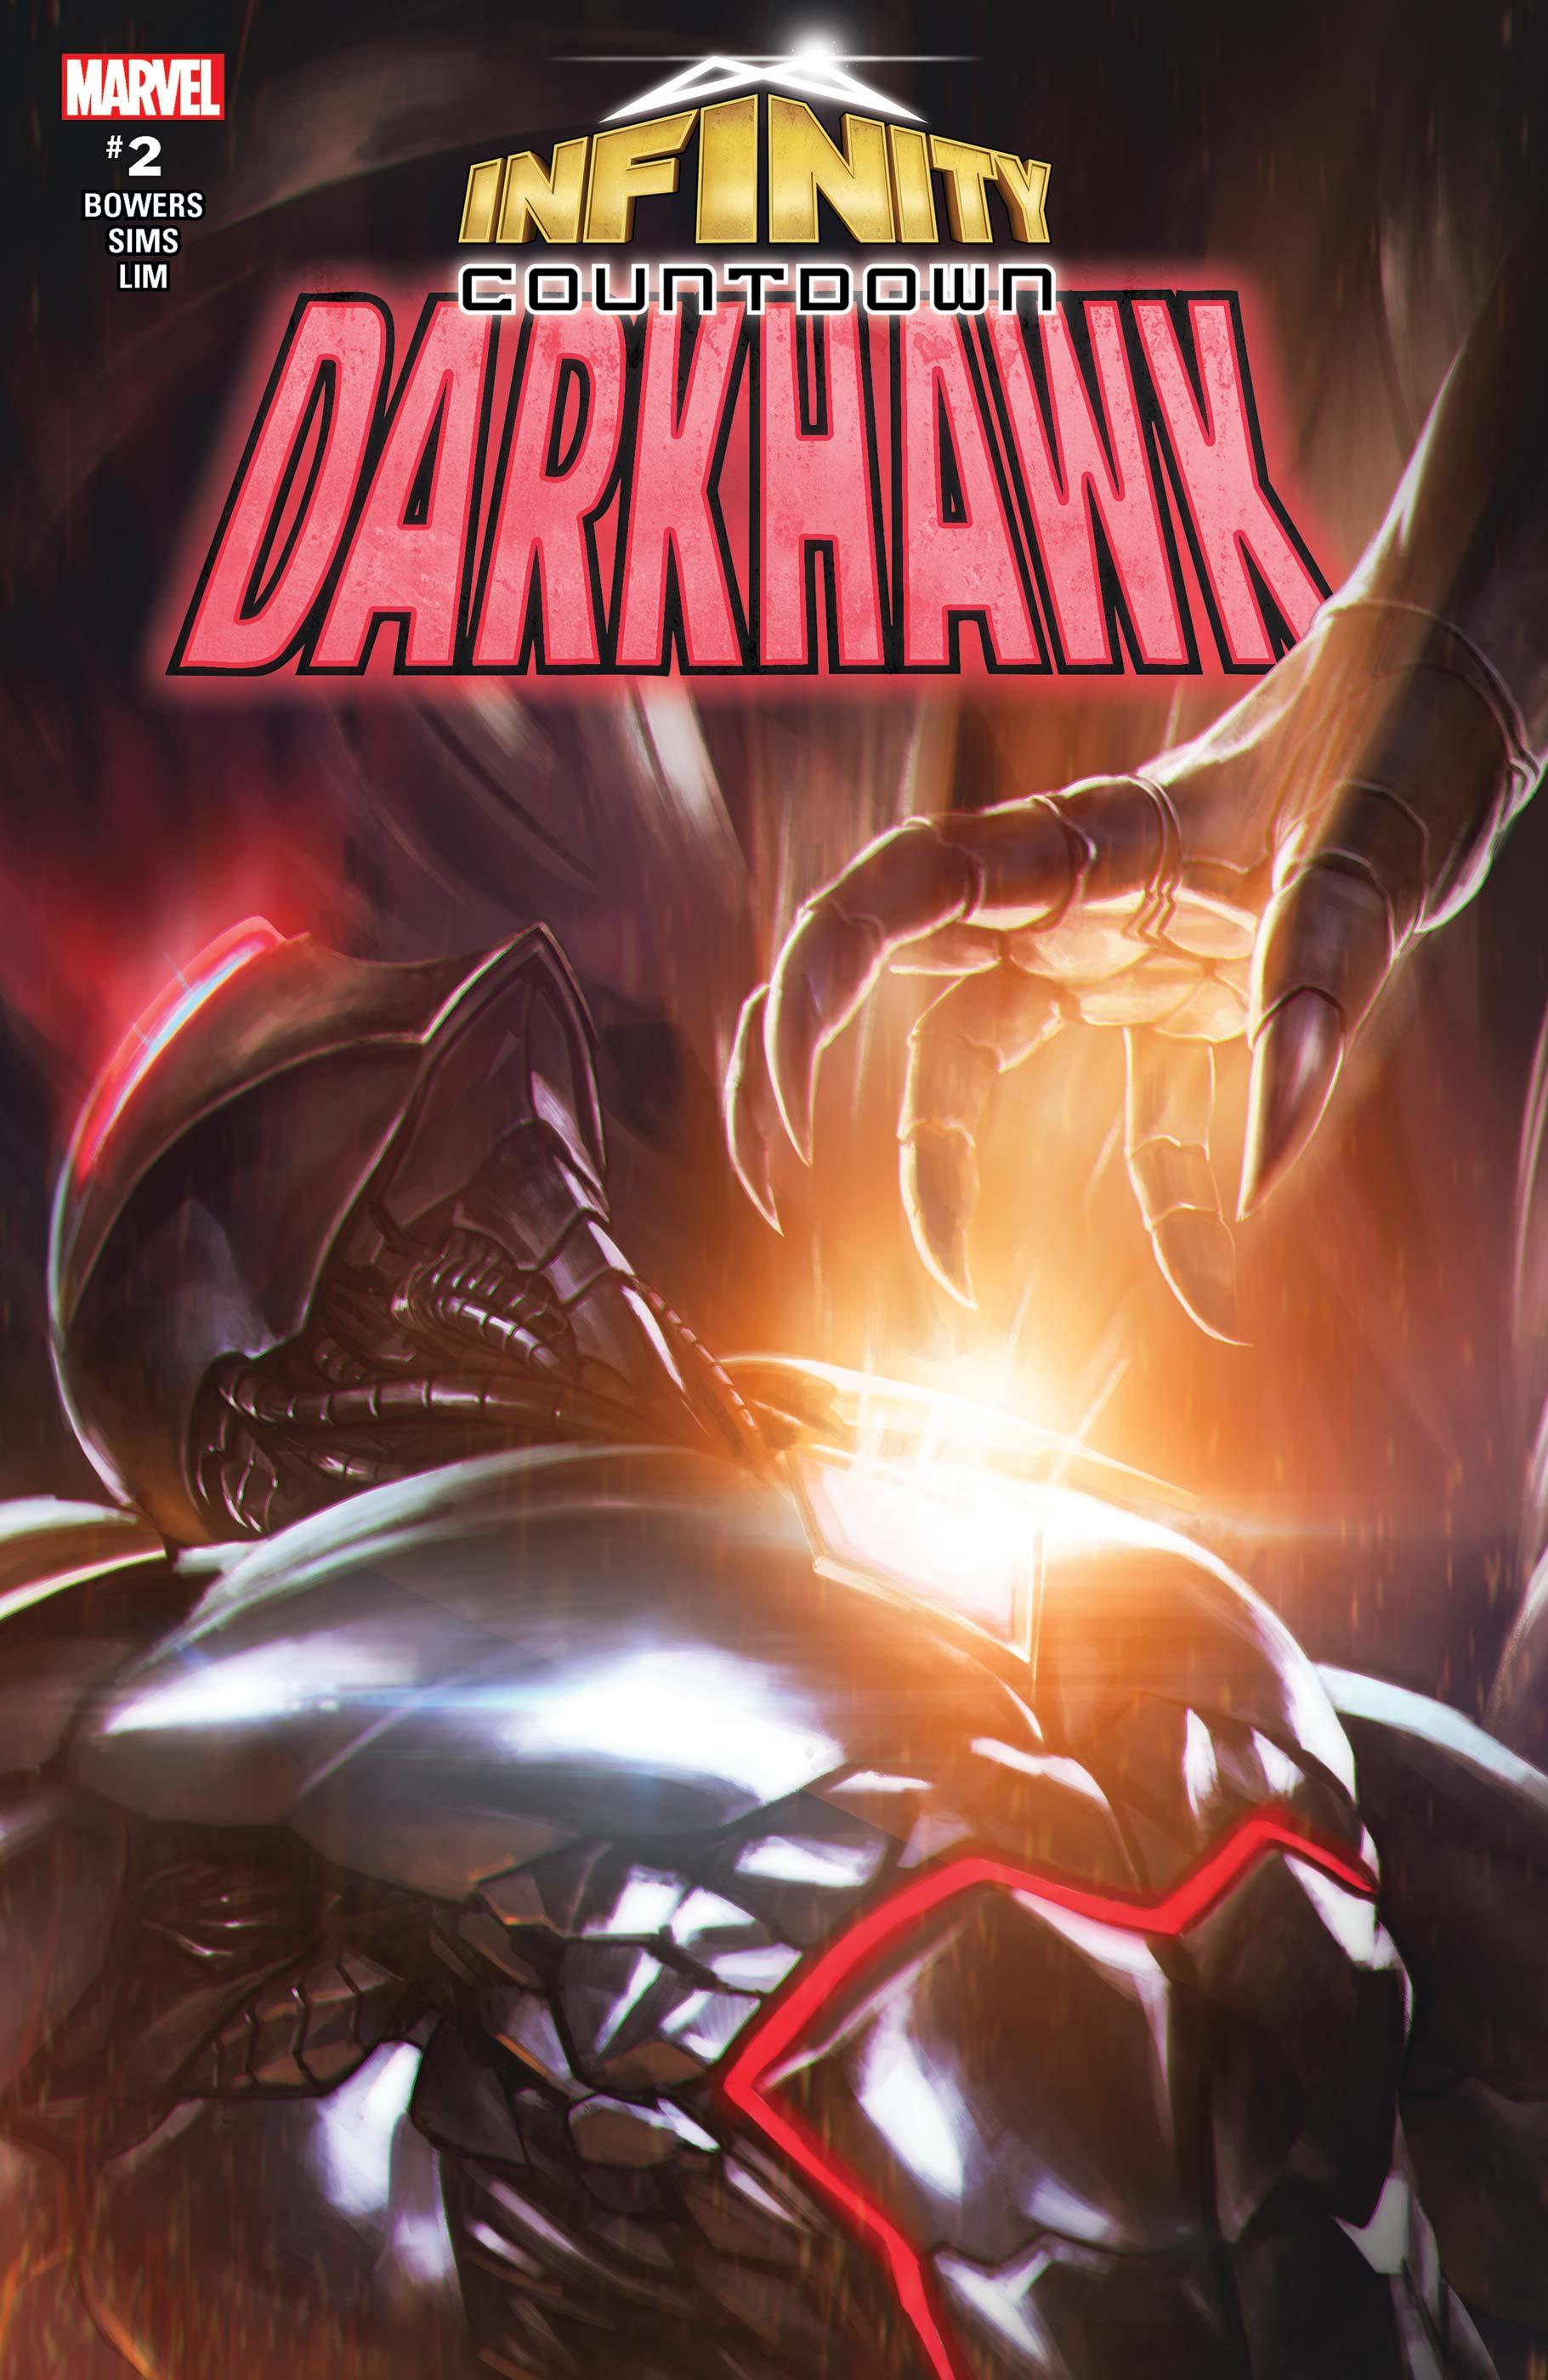 Infinity Countdown: Darkhawk (2018) #2